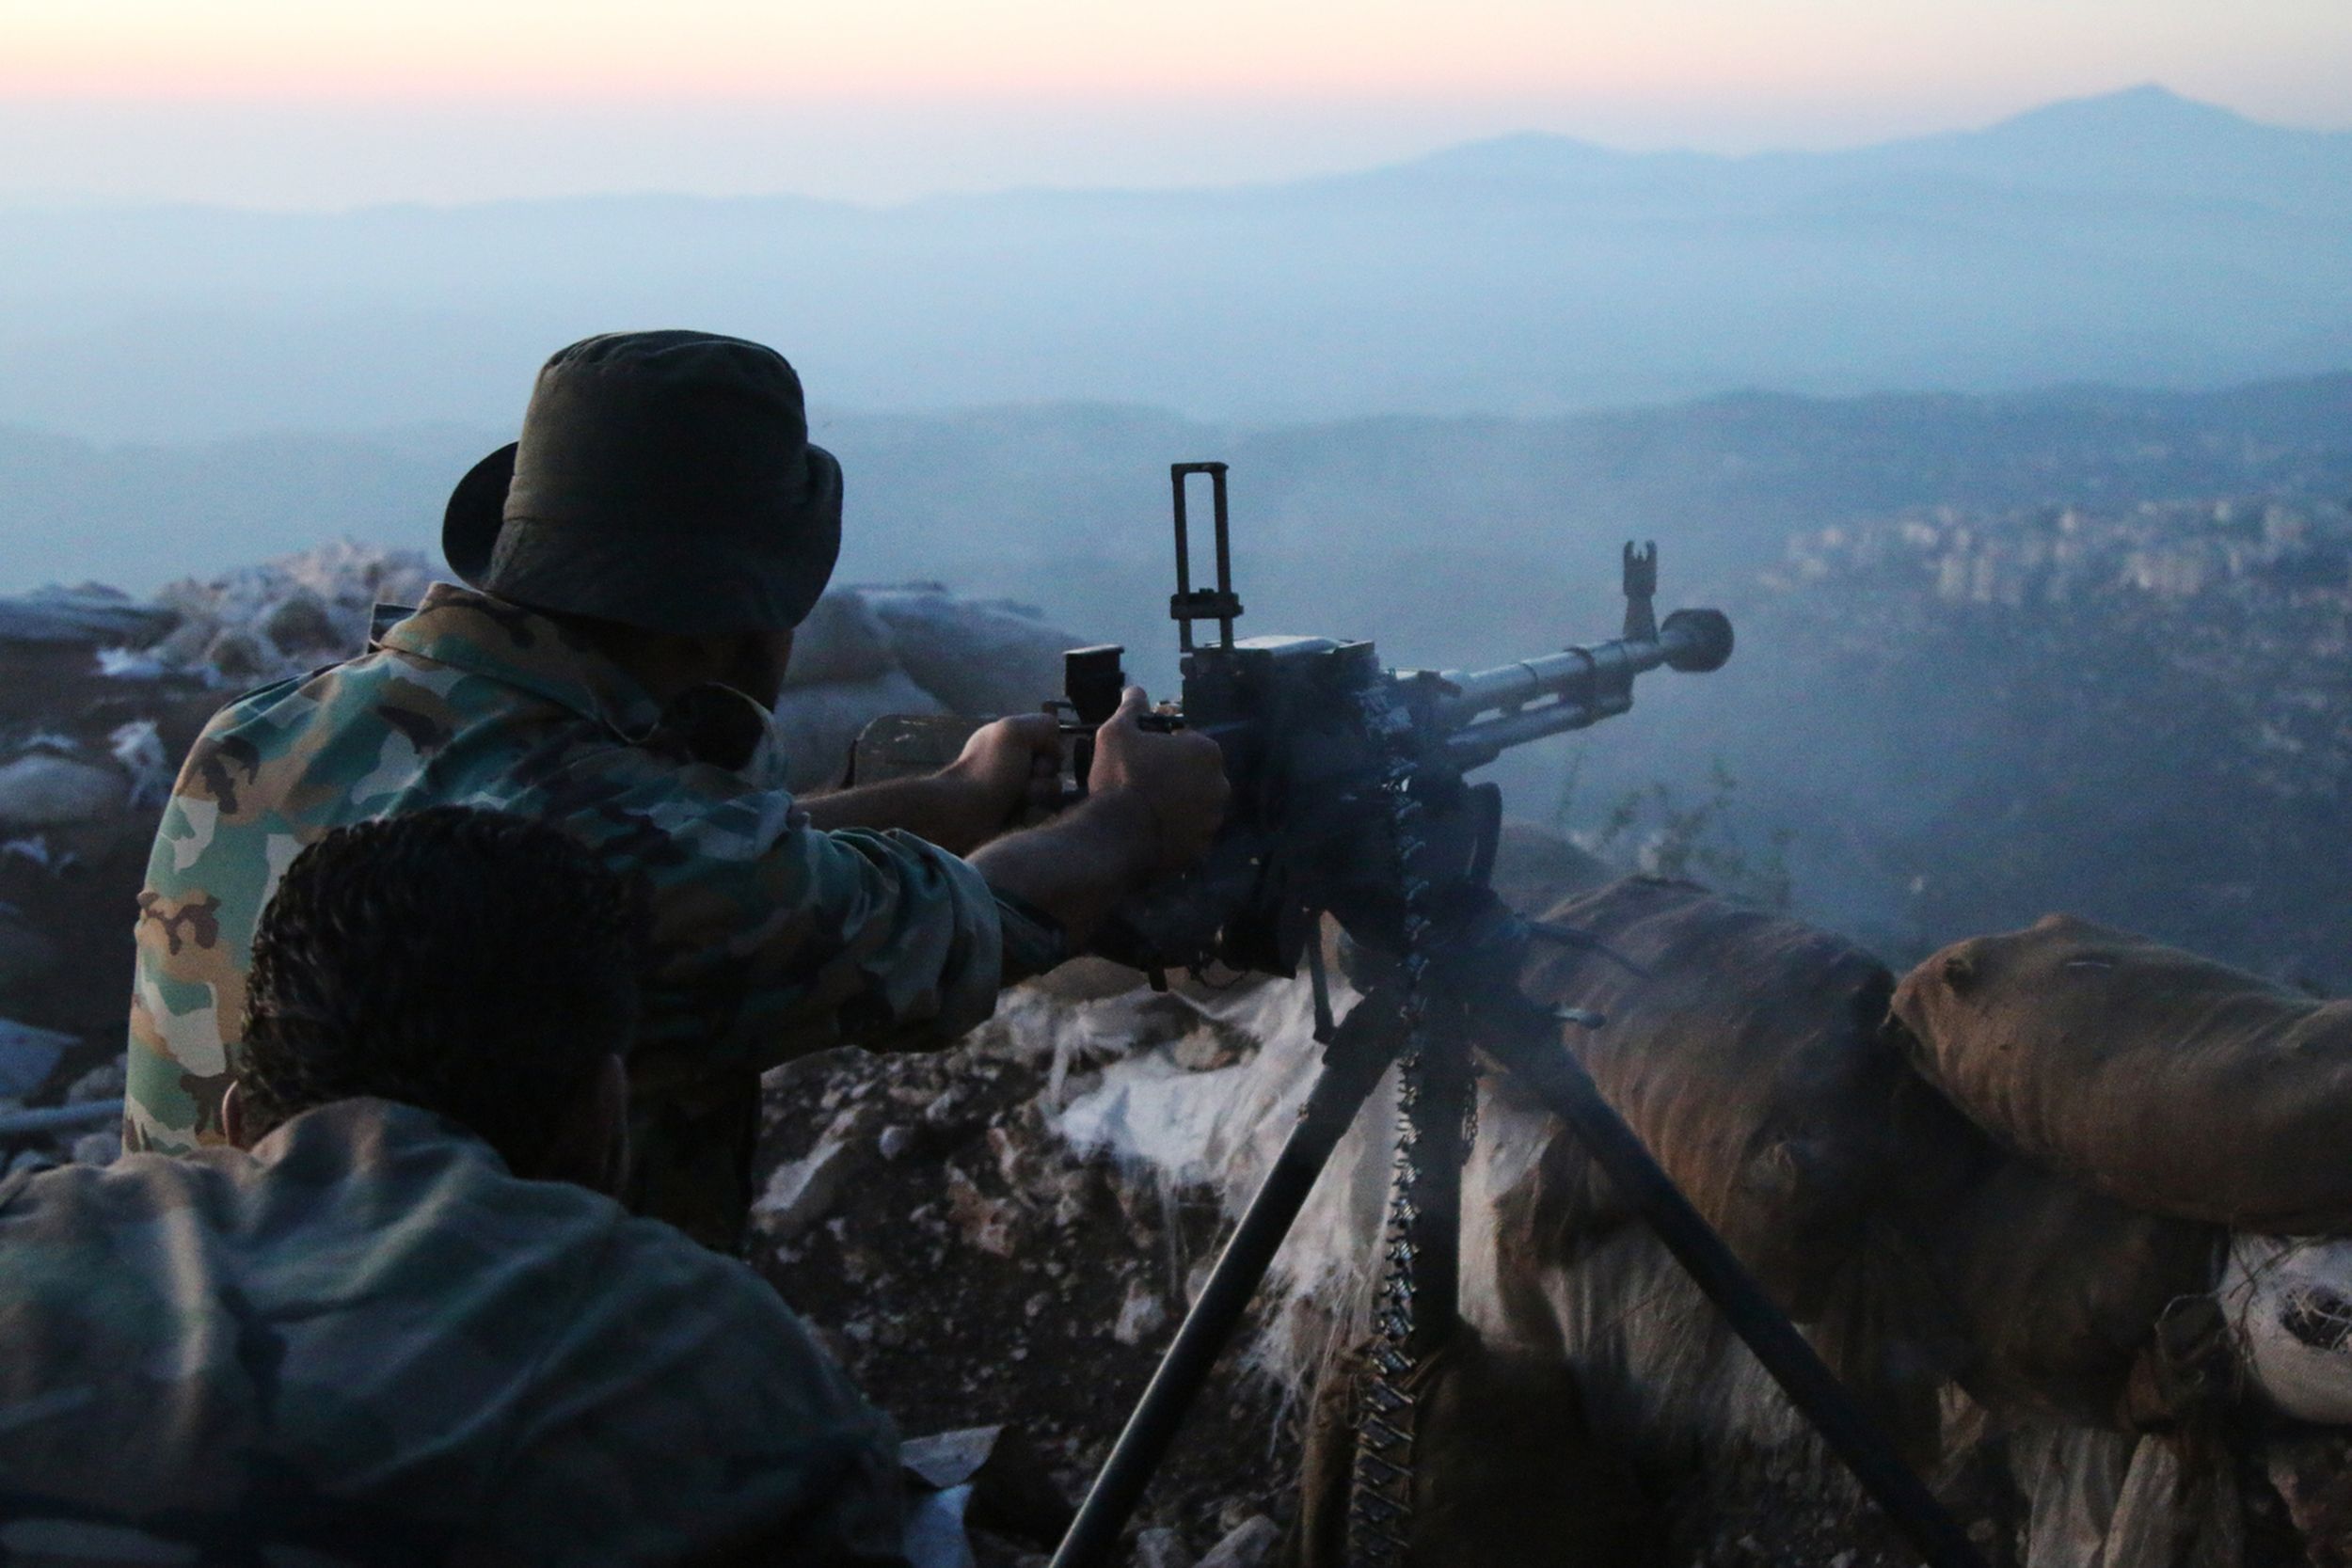 Koliko će trajati trijumf Rusije u Siriji?